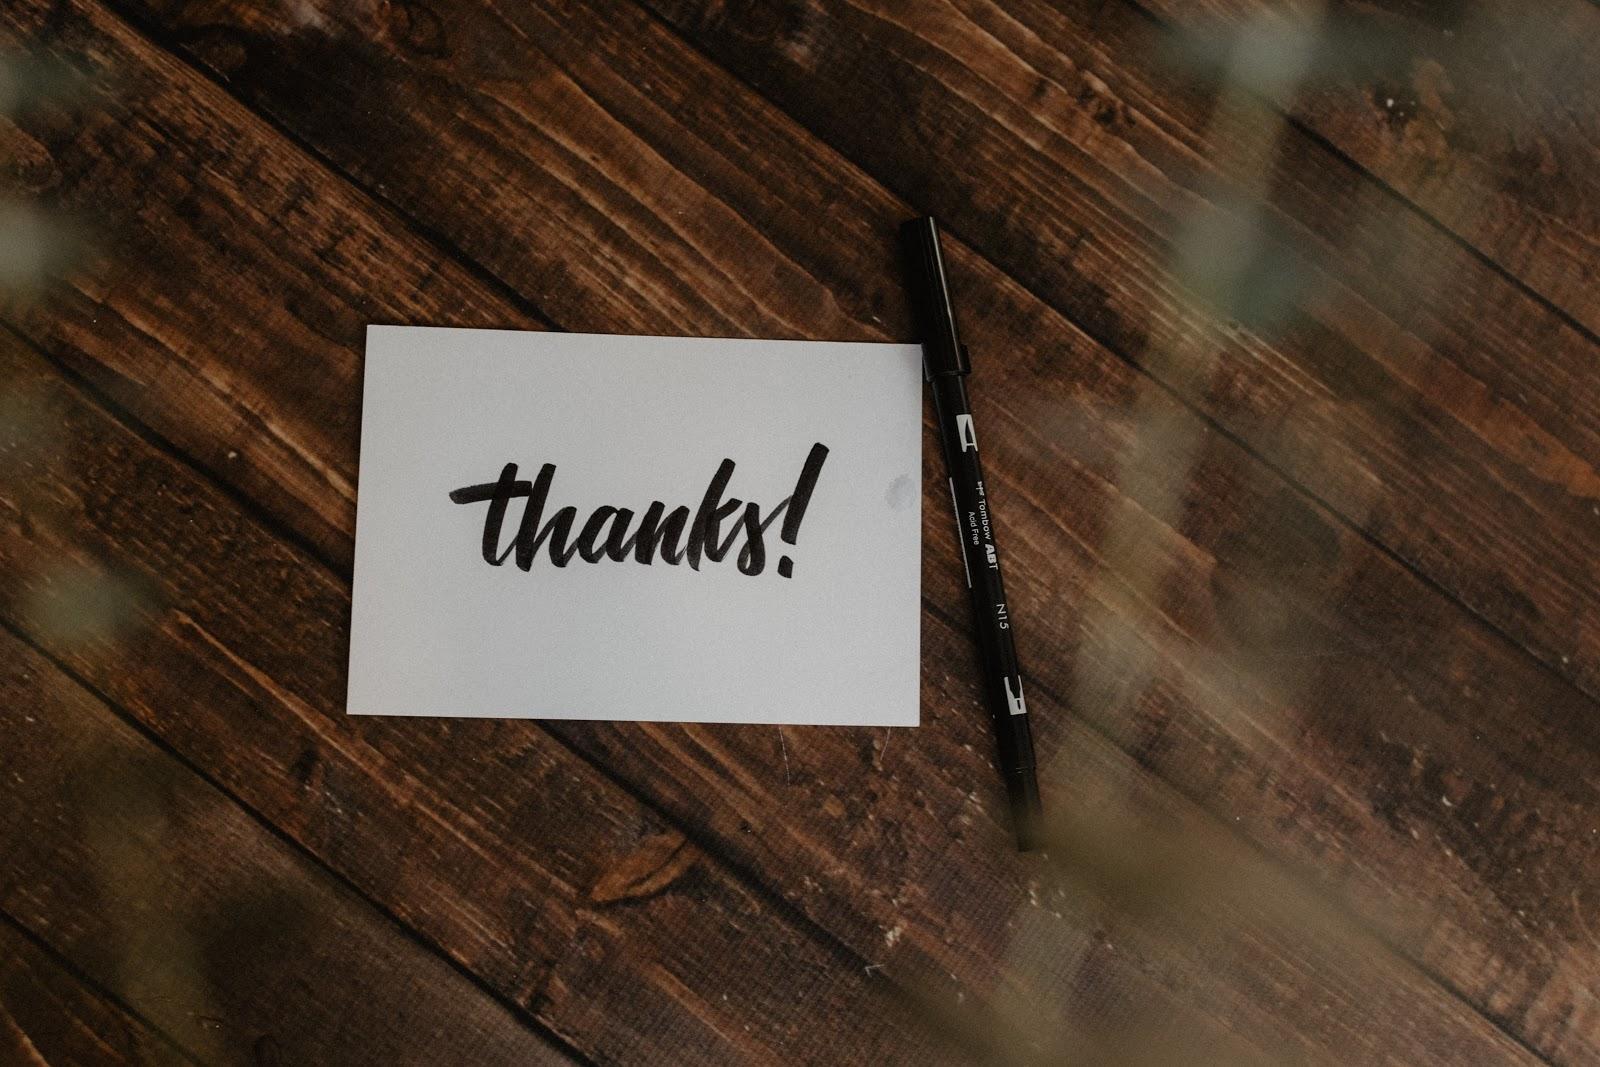 Thanks! on a customer service card